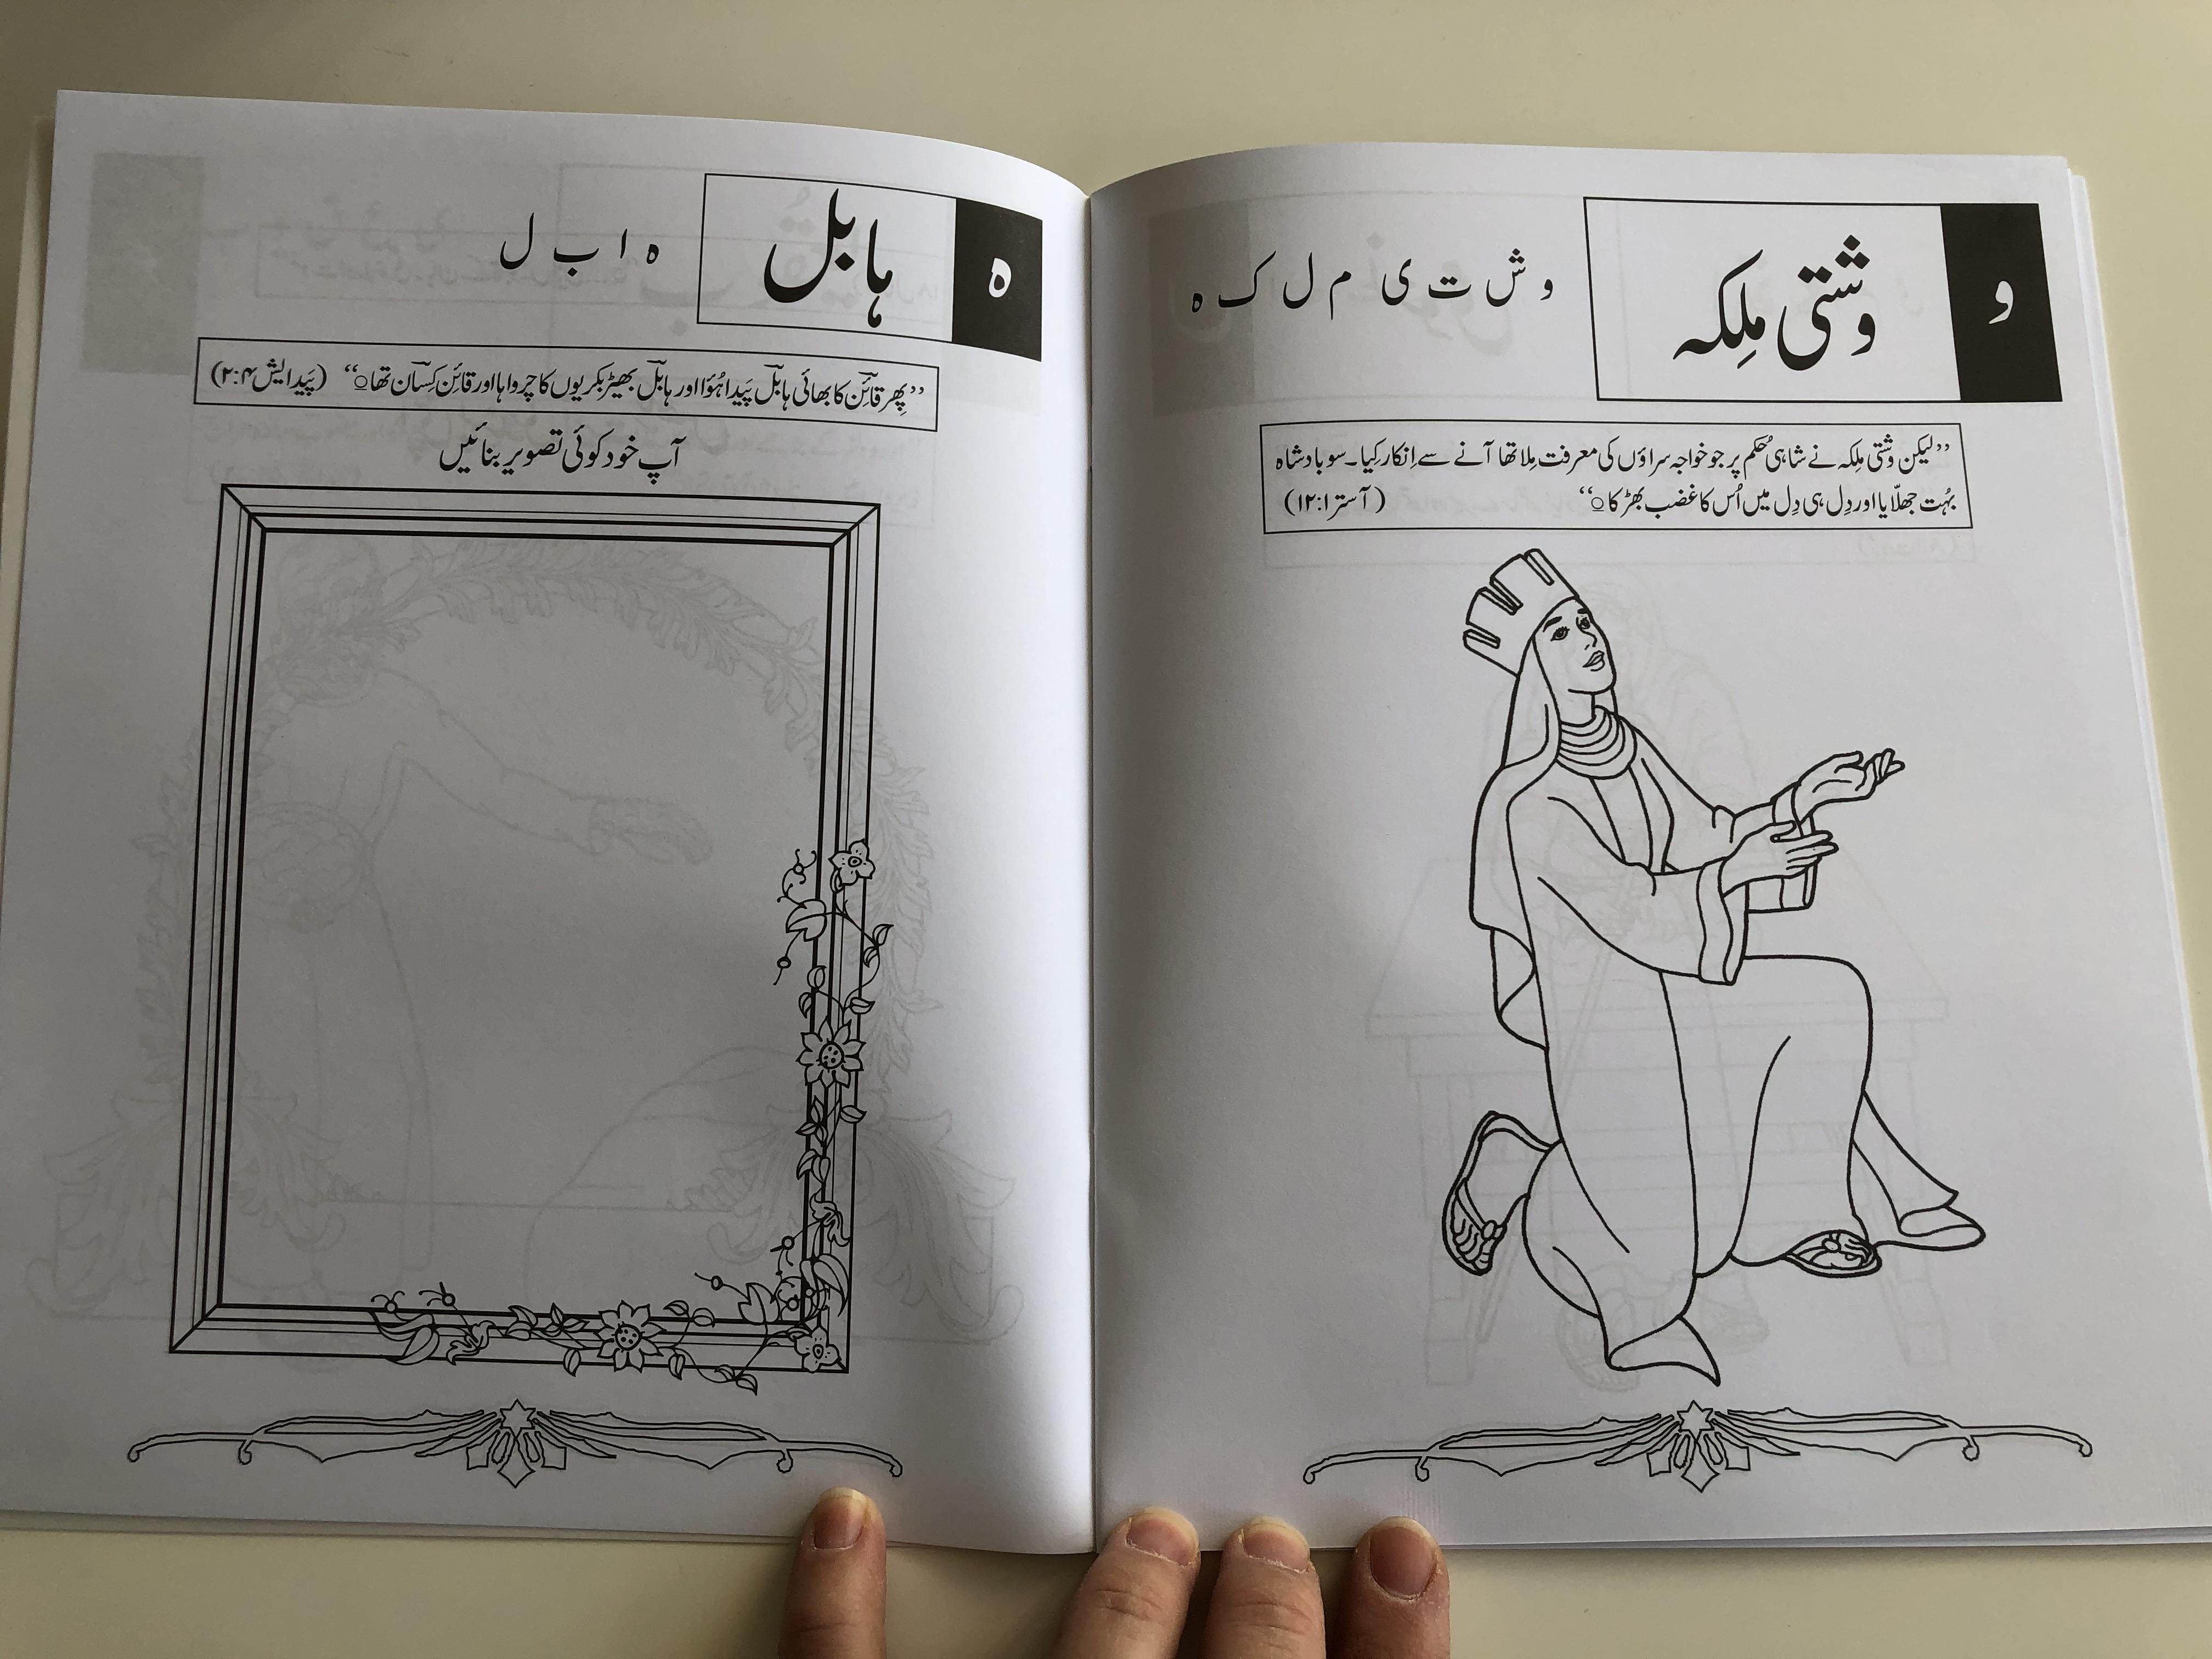 abc-of-the-bible-urdu-language-children-s-coloring-book-paperback-5.jpg